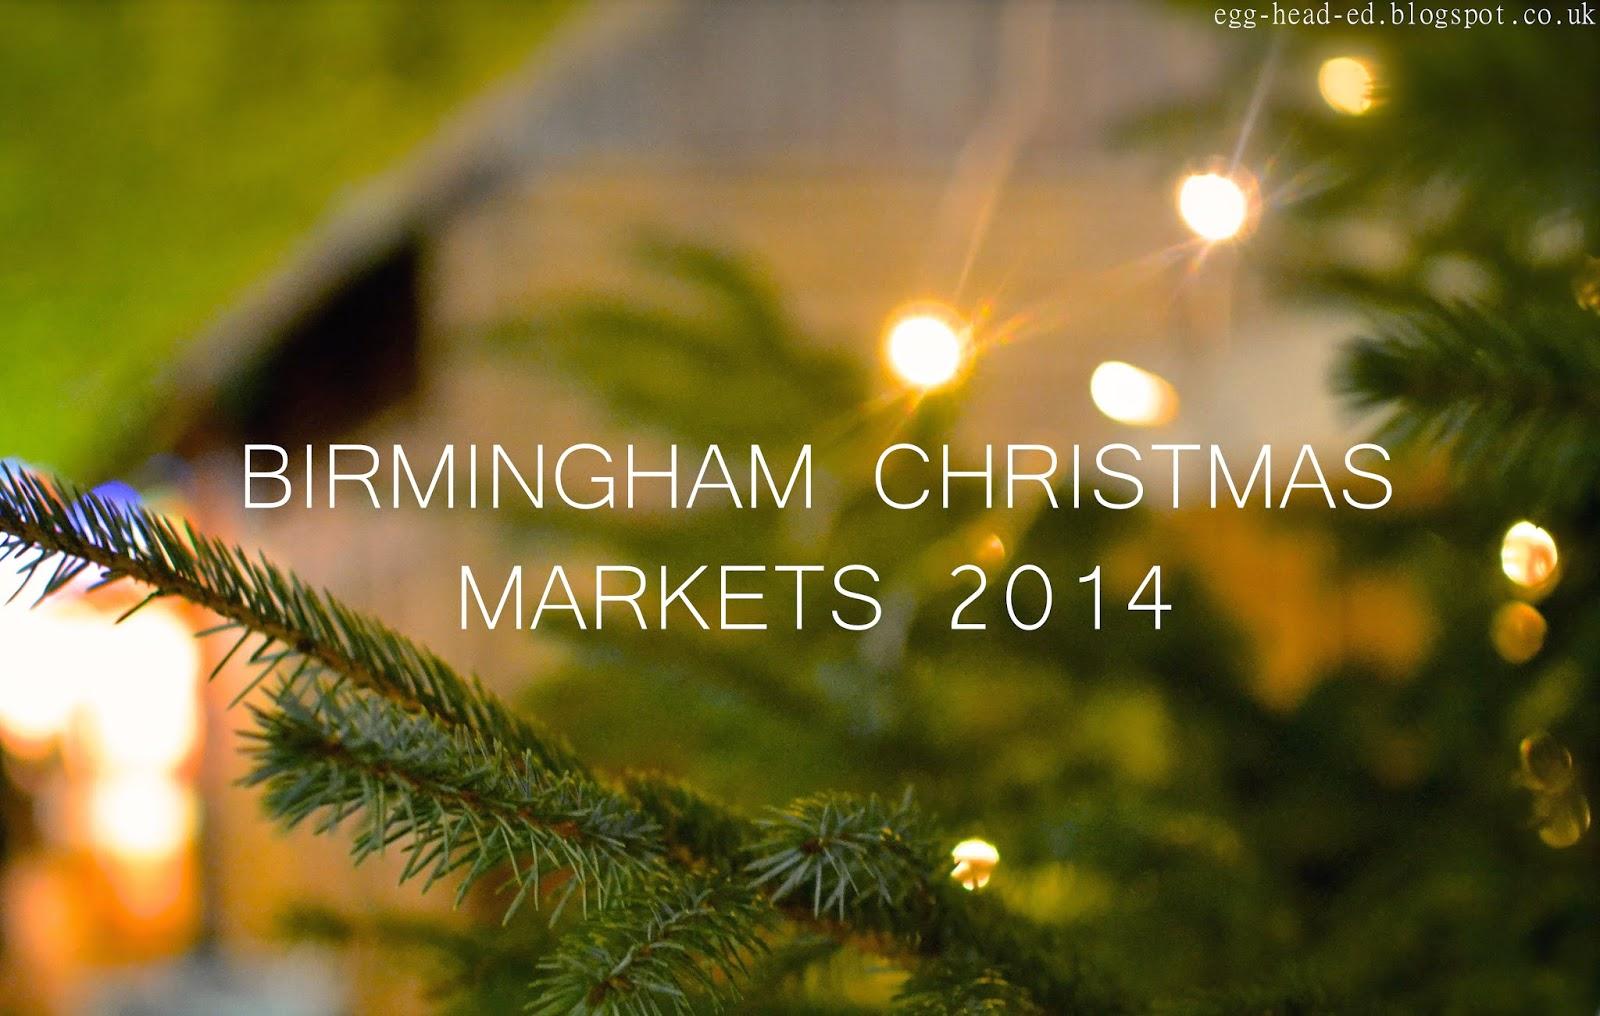 BIRMINGHAM'S CHRISTMAS MARKETS 2014